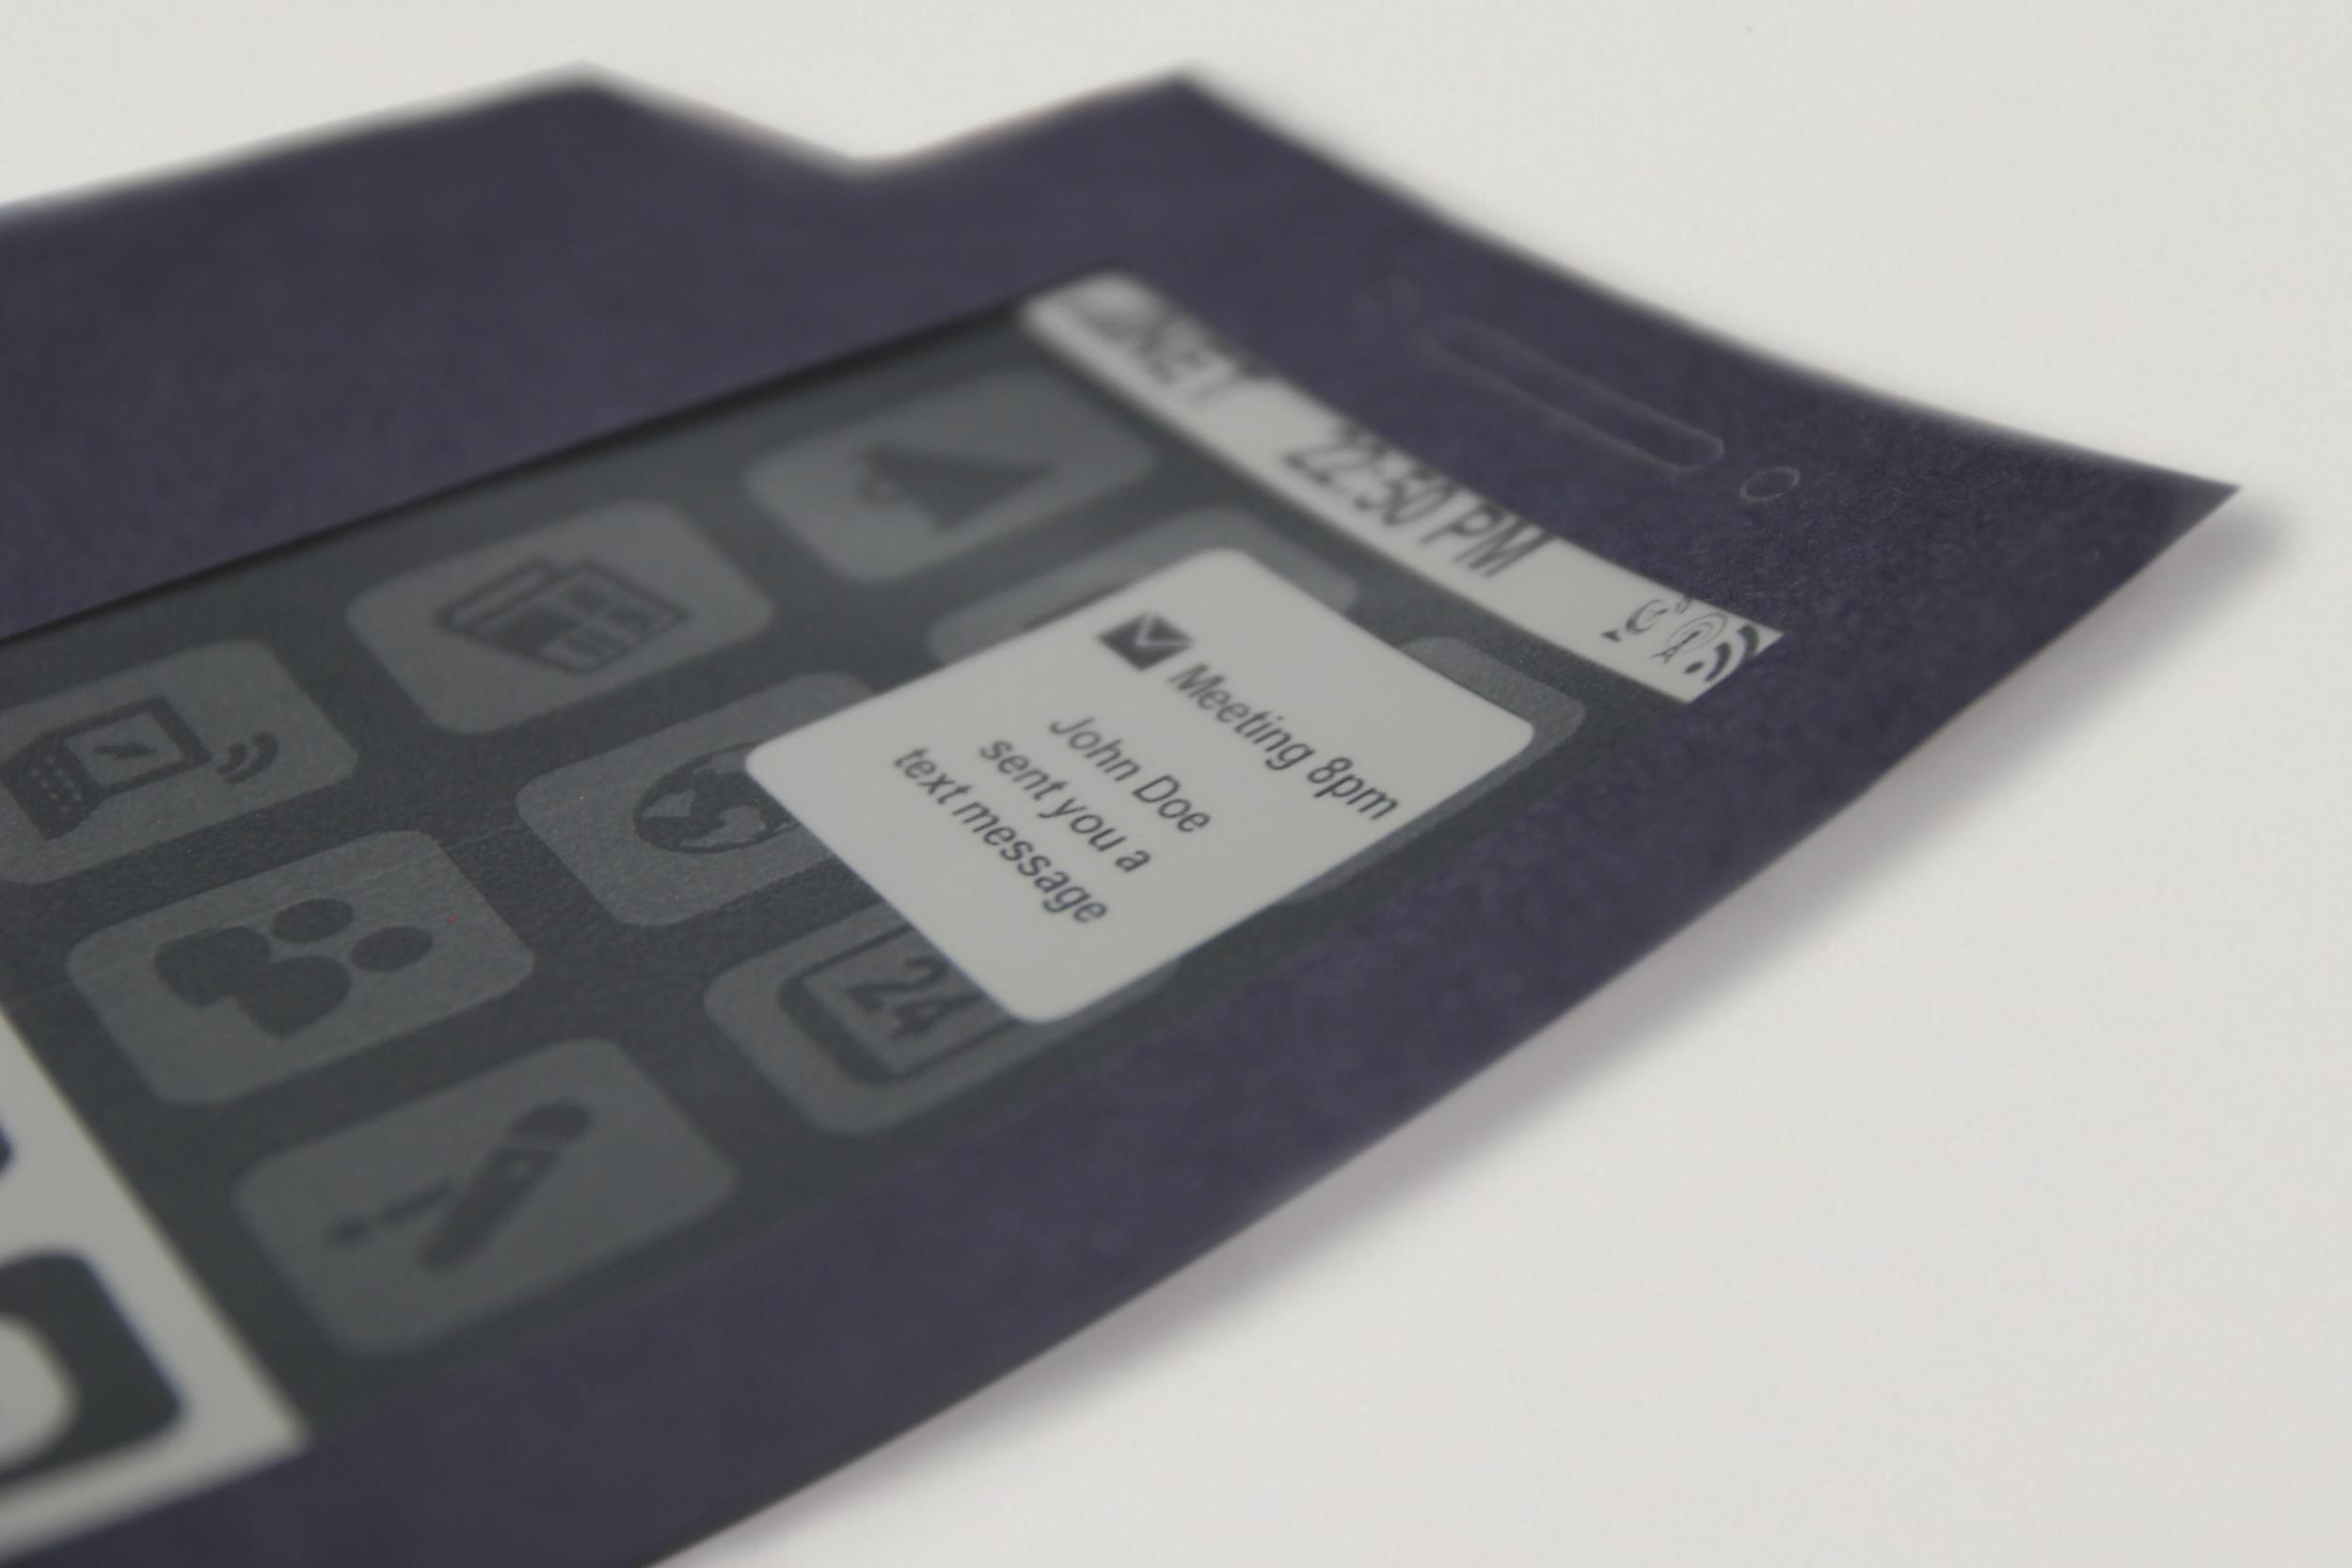 morephone (2013): message notification (close up)